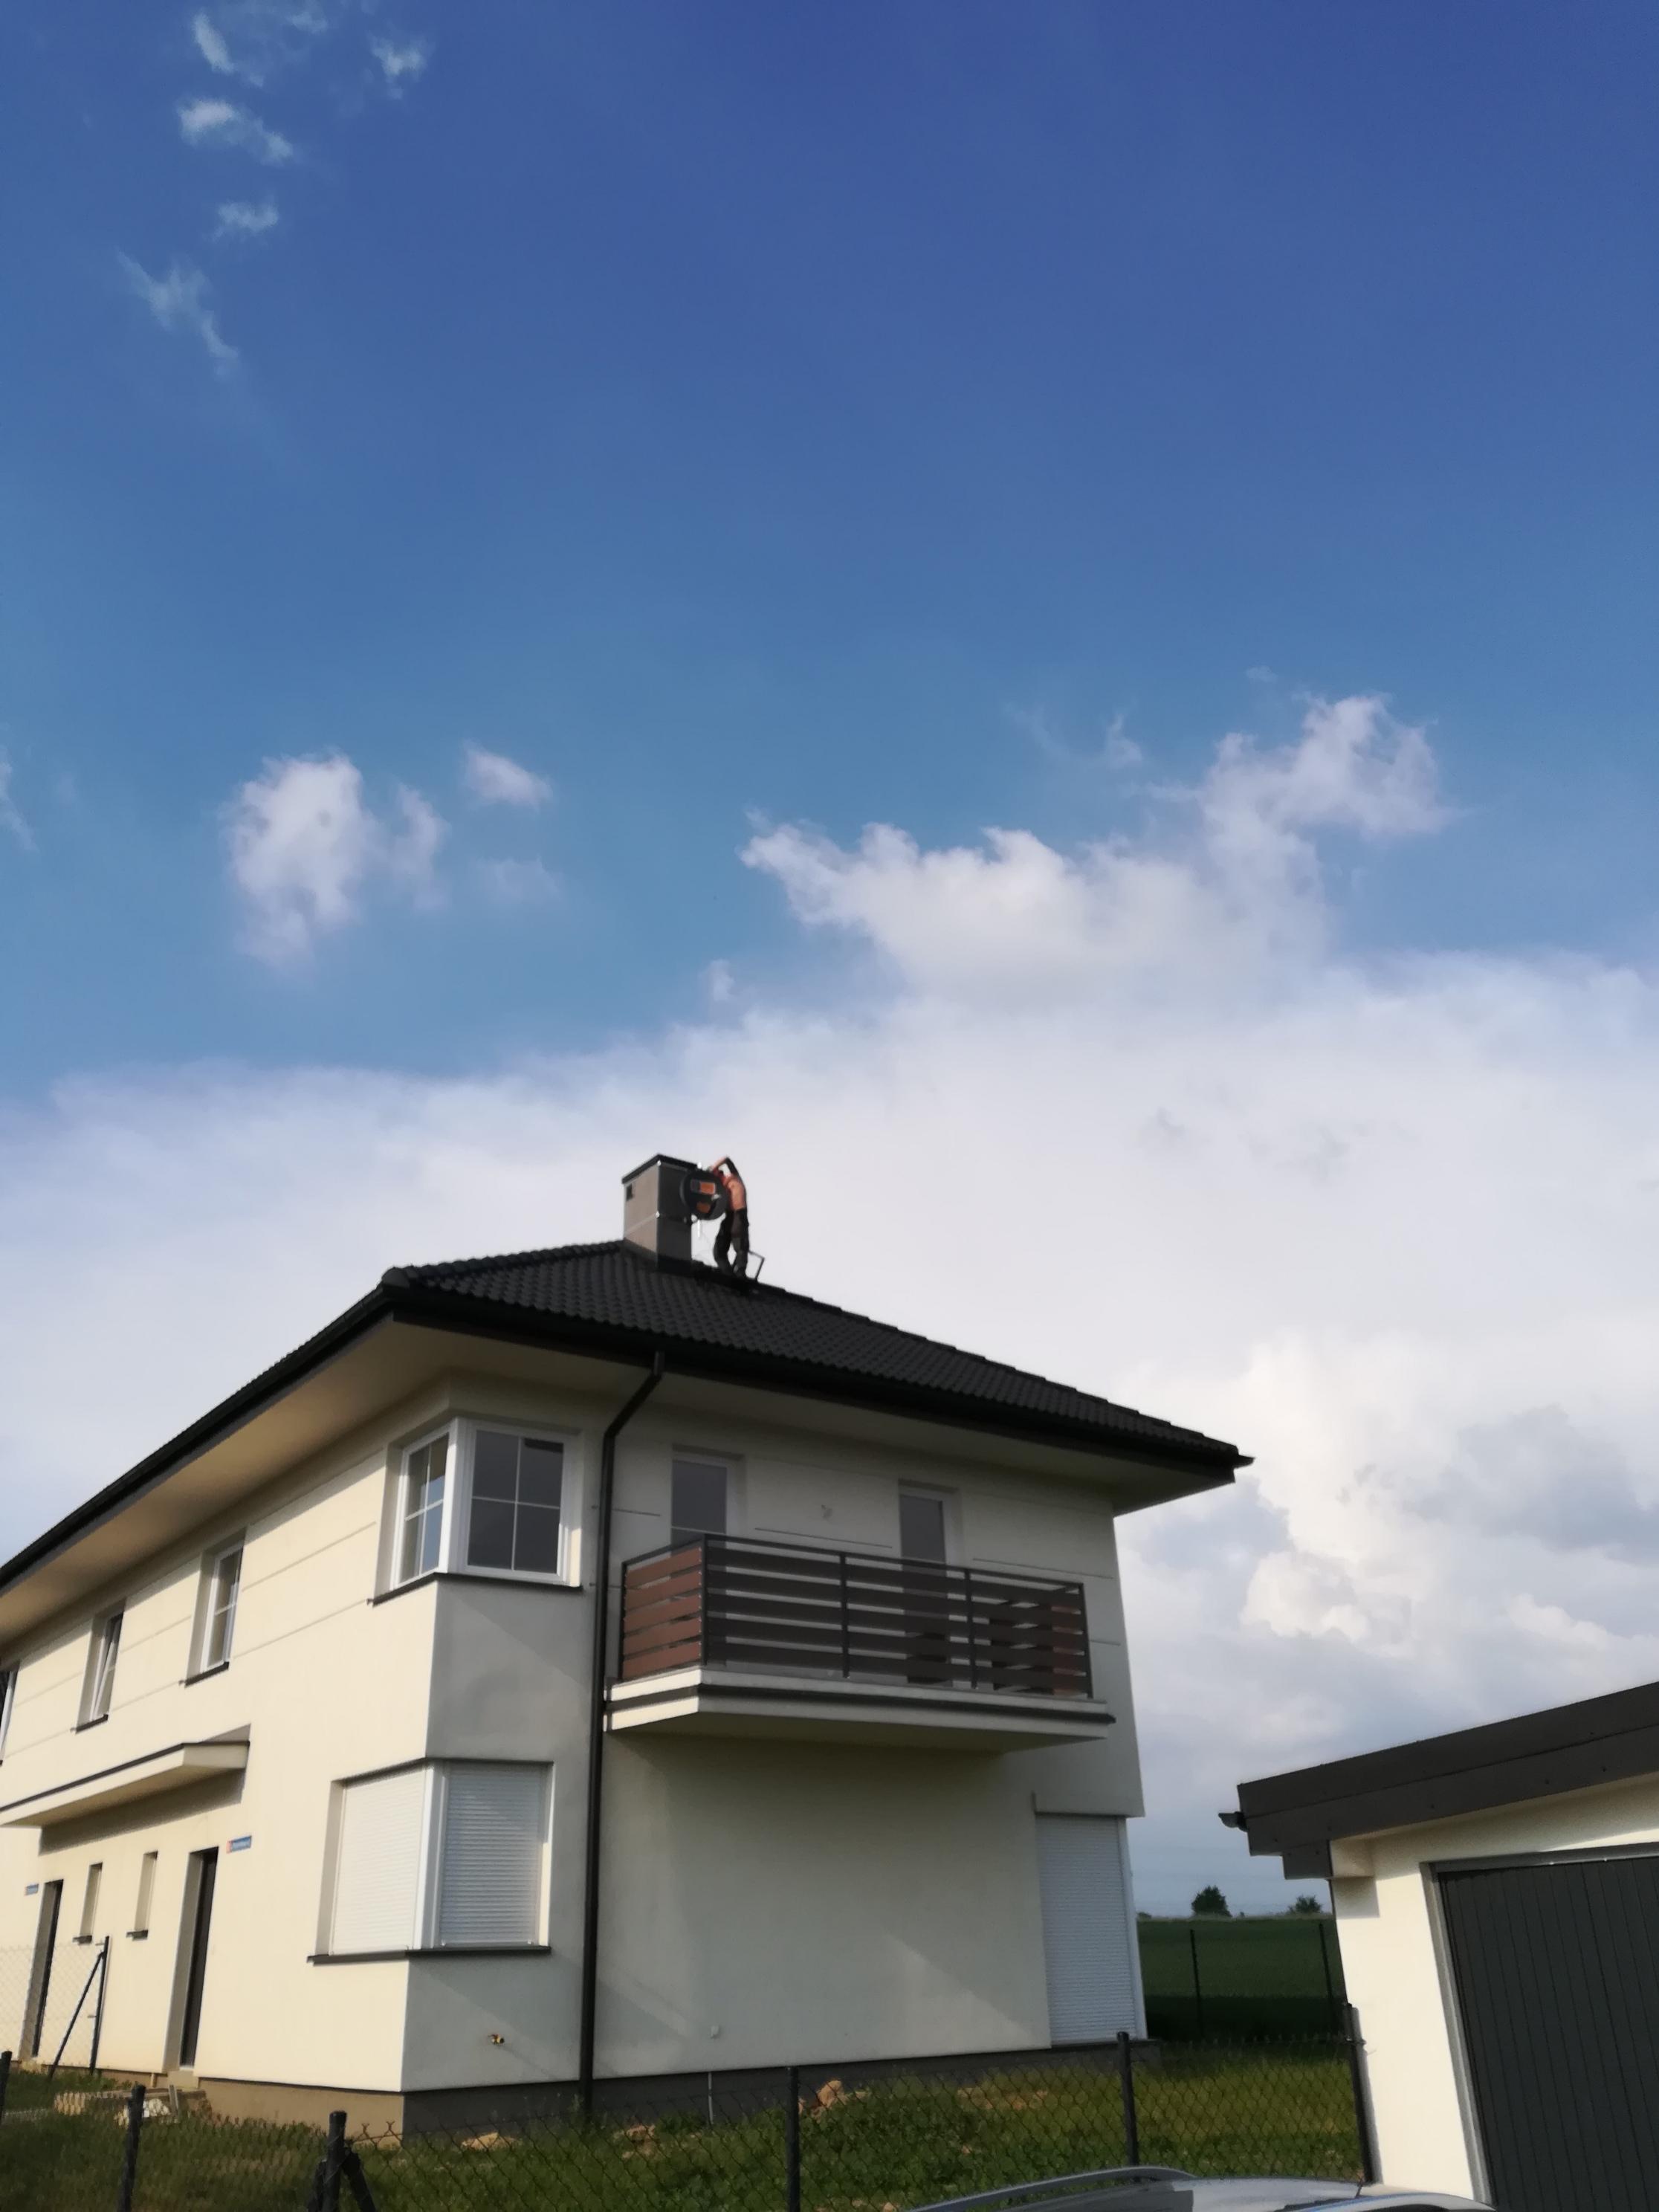 Antena Pyskowice